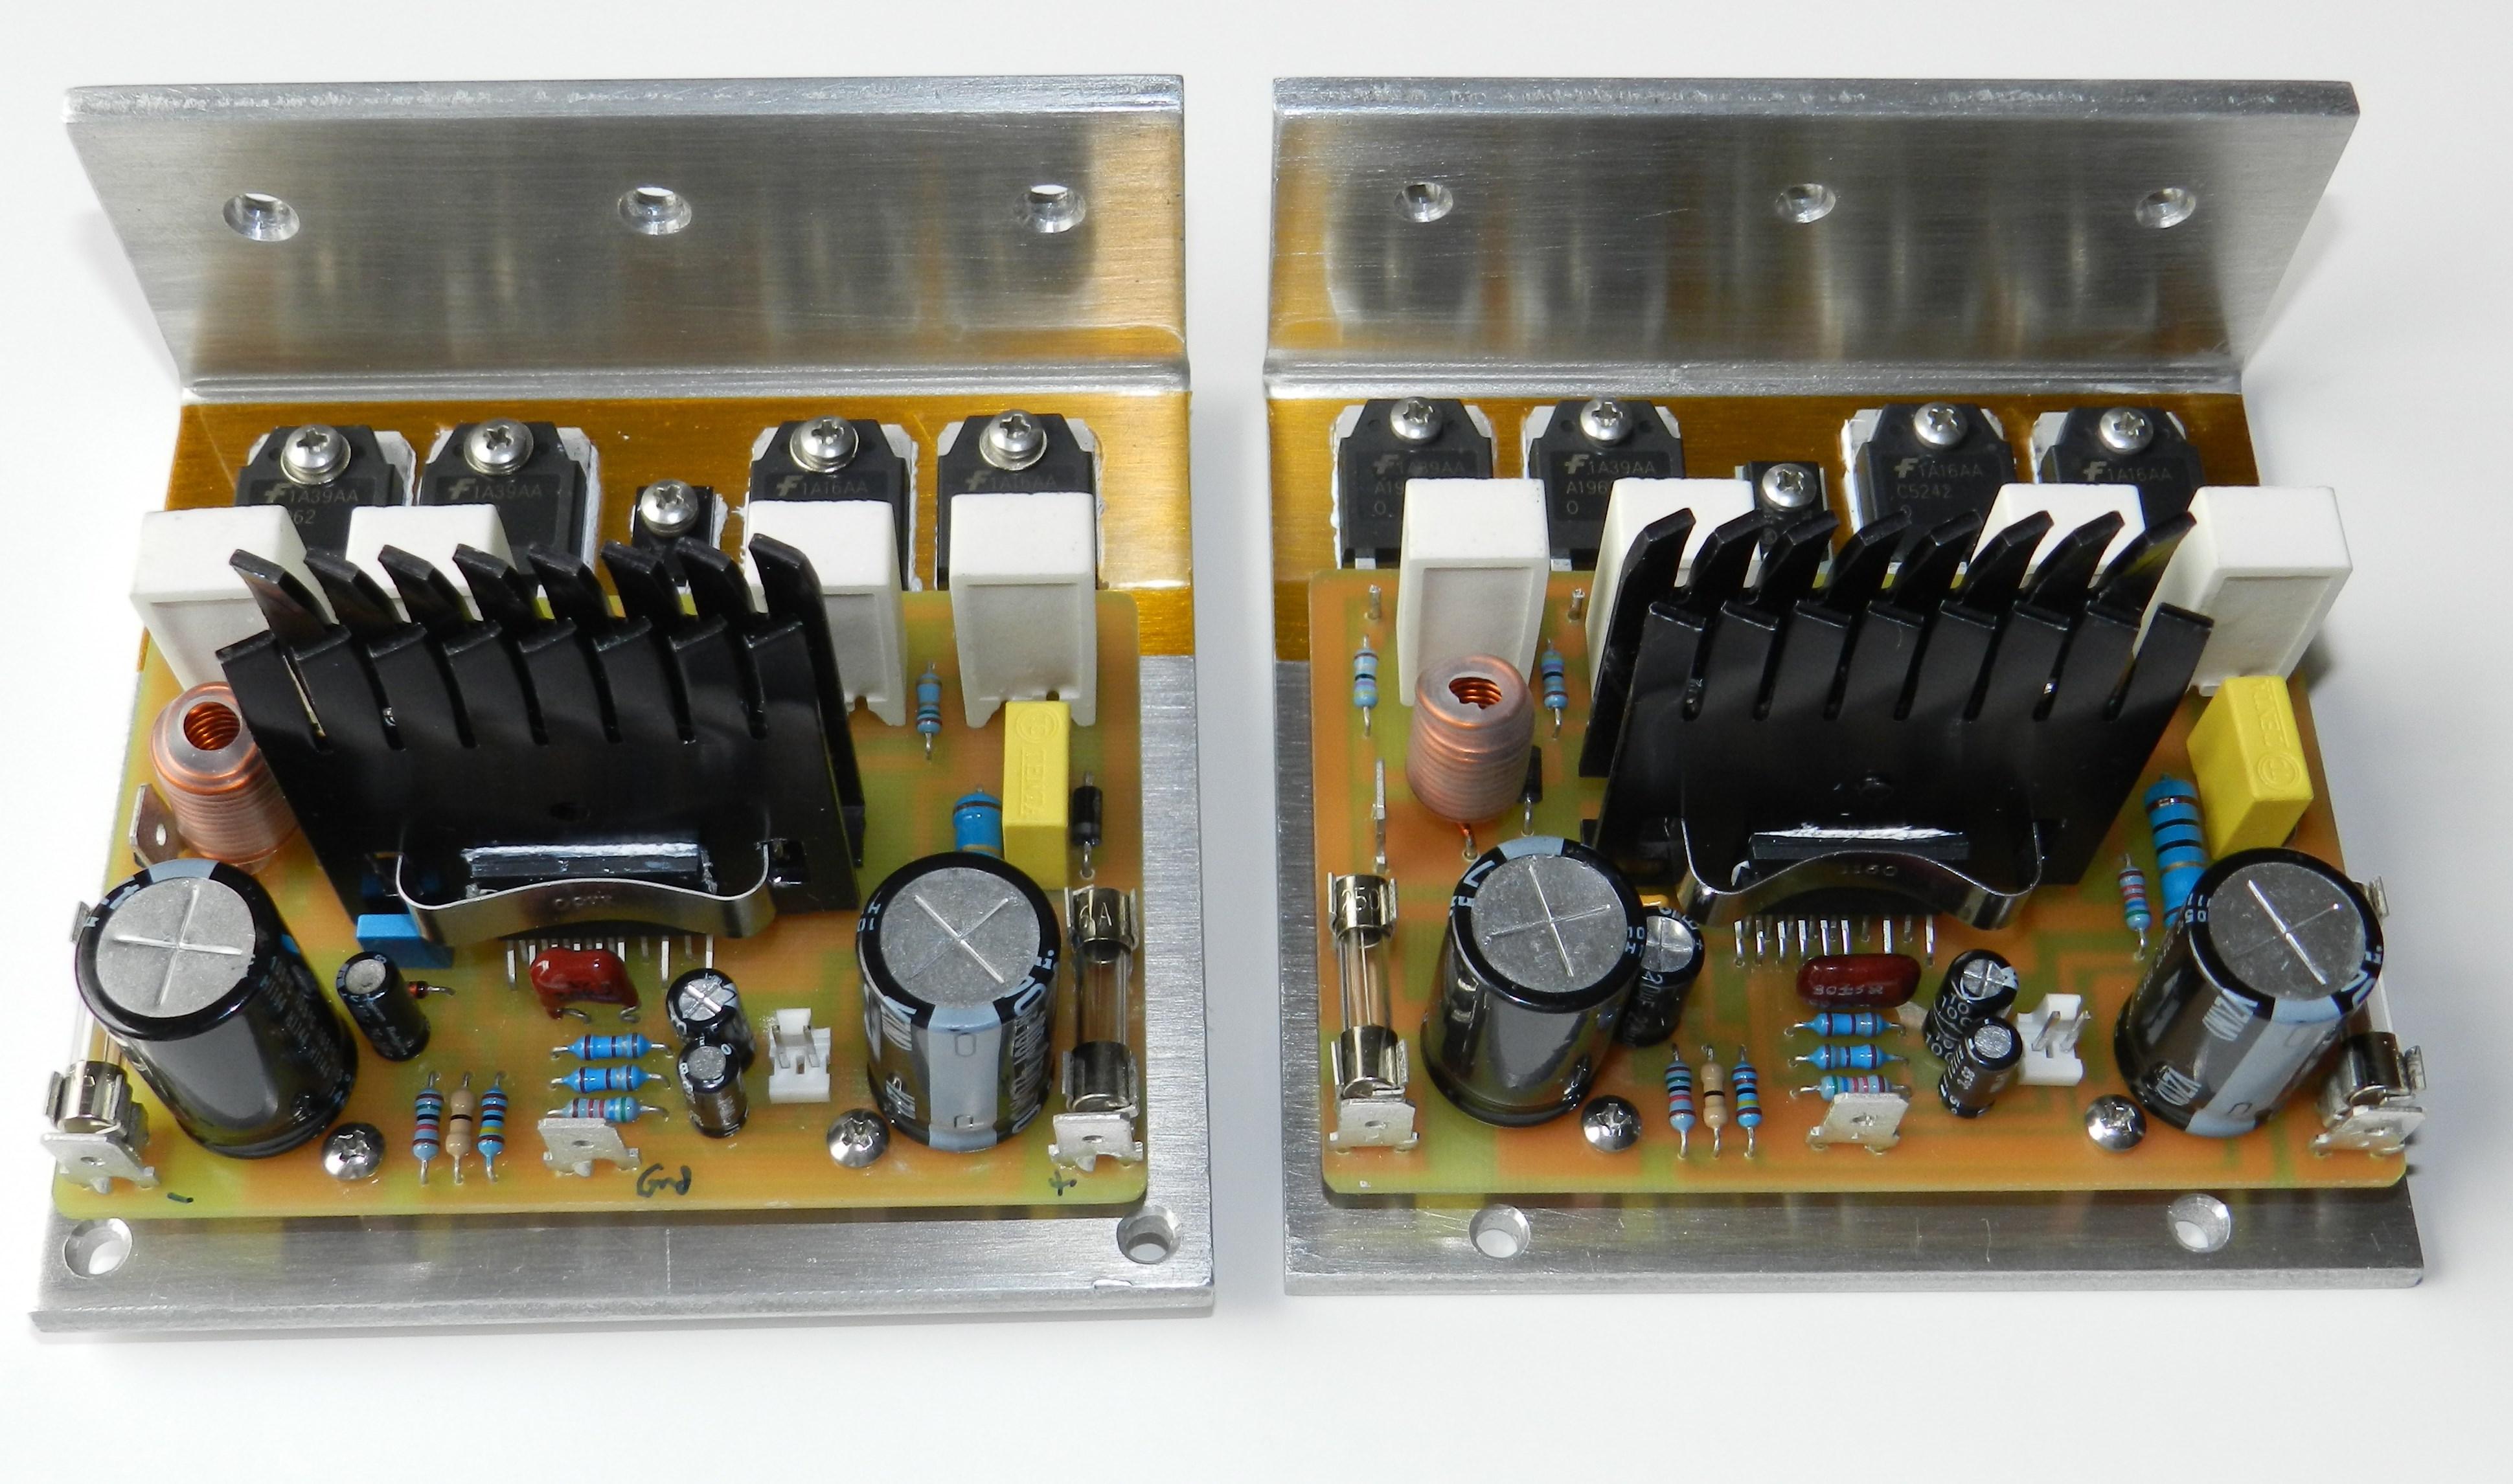 Project 8 Buildaudioamps 400w Audio Amplifier Schema And Layout Dscn4381 2